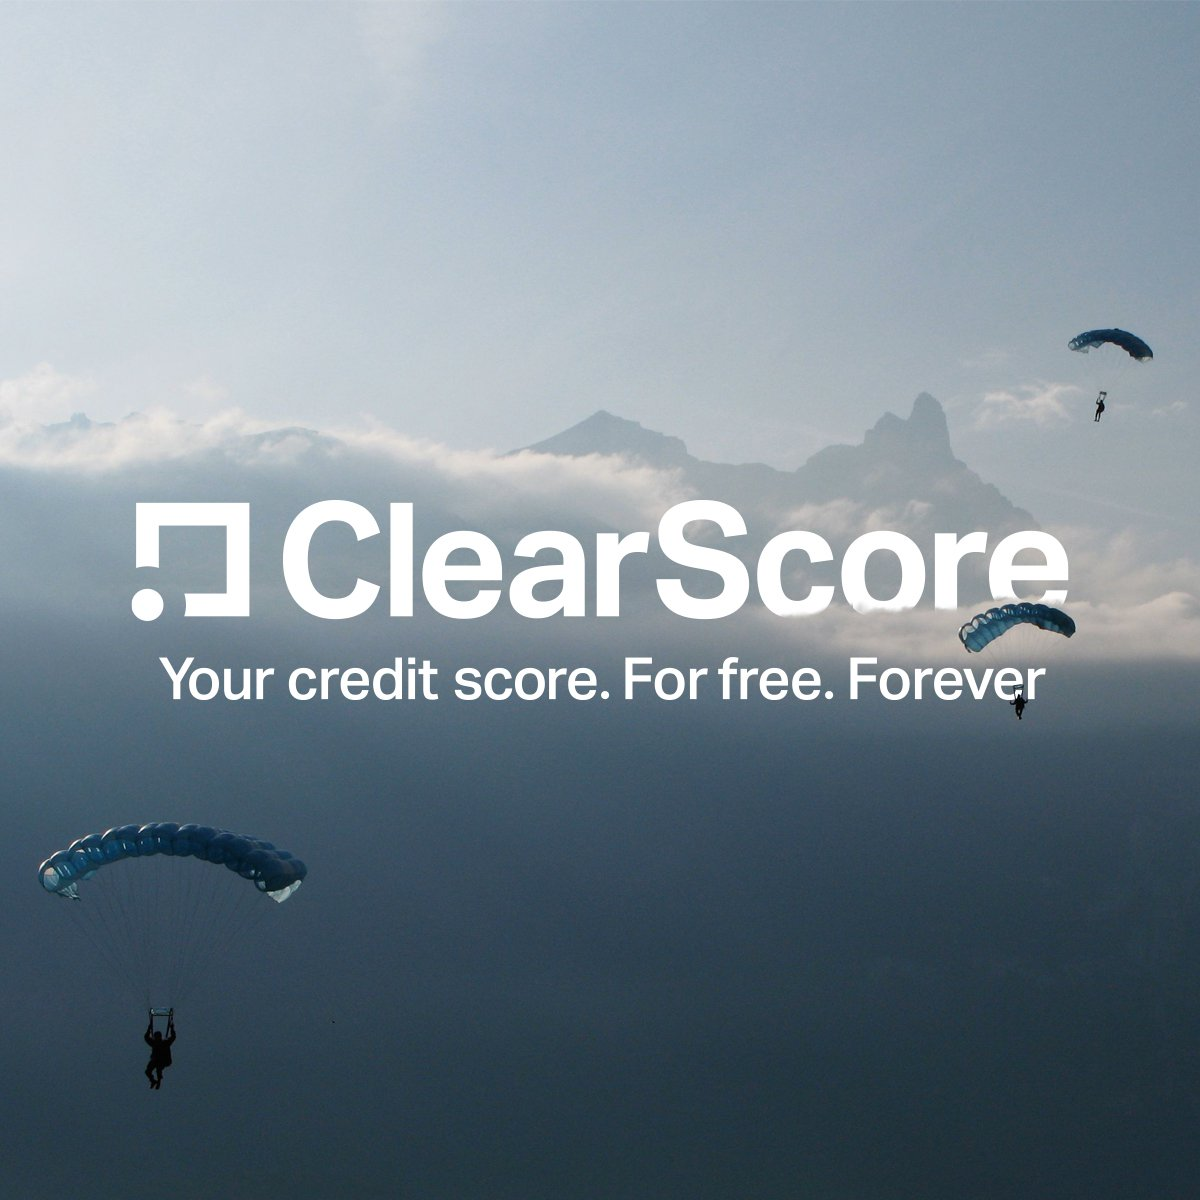 Clearscore